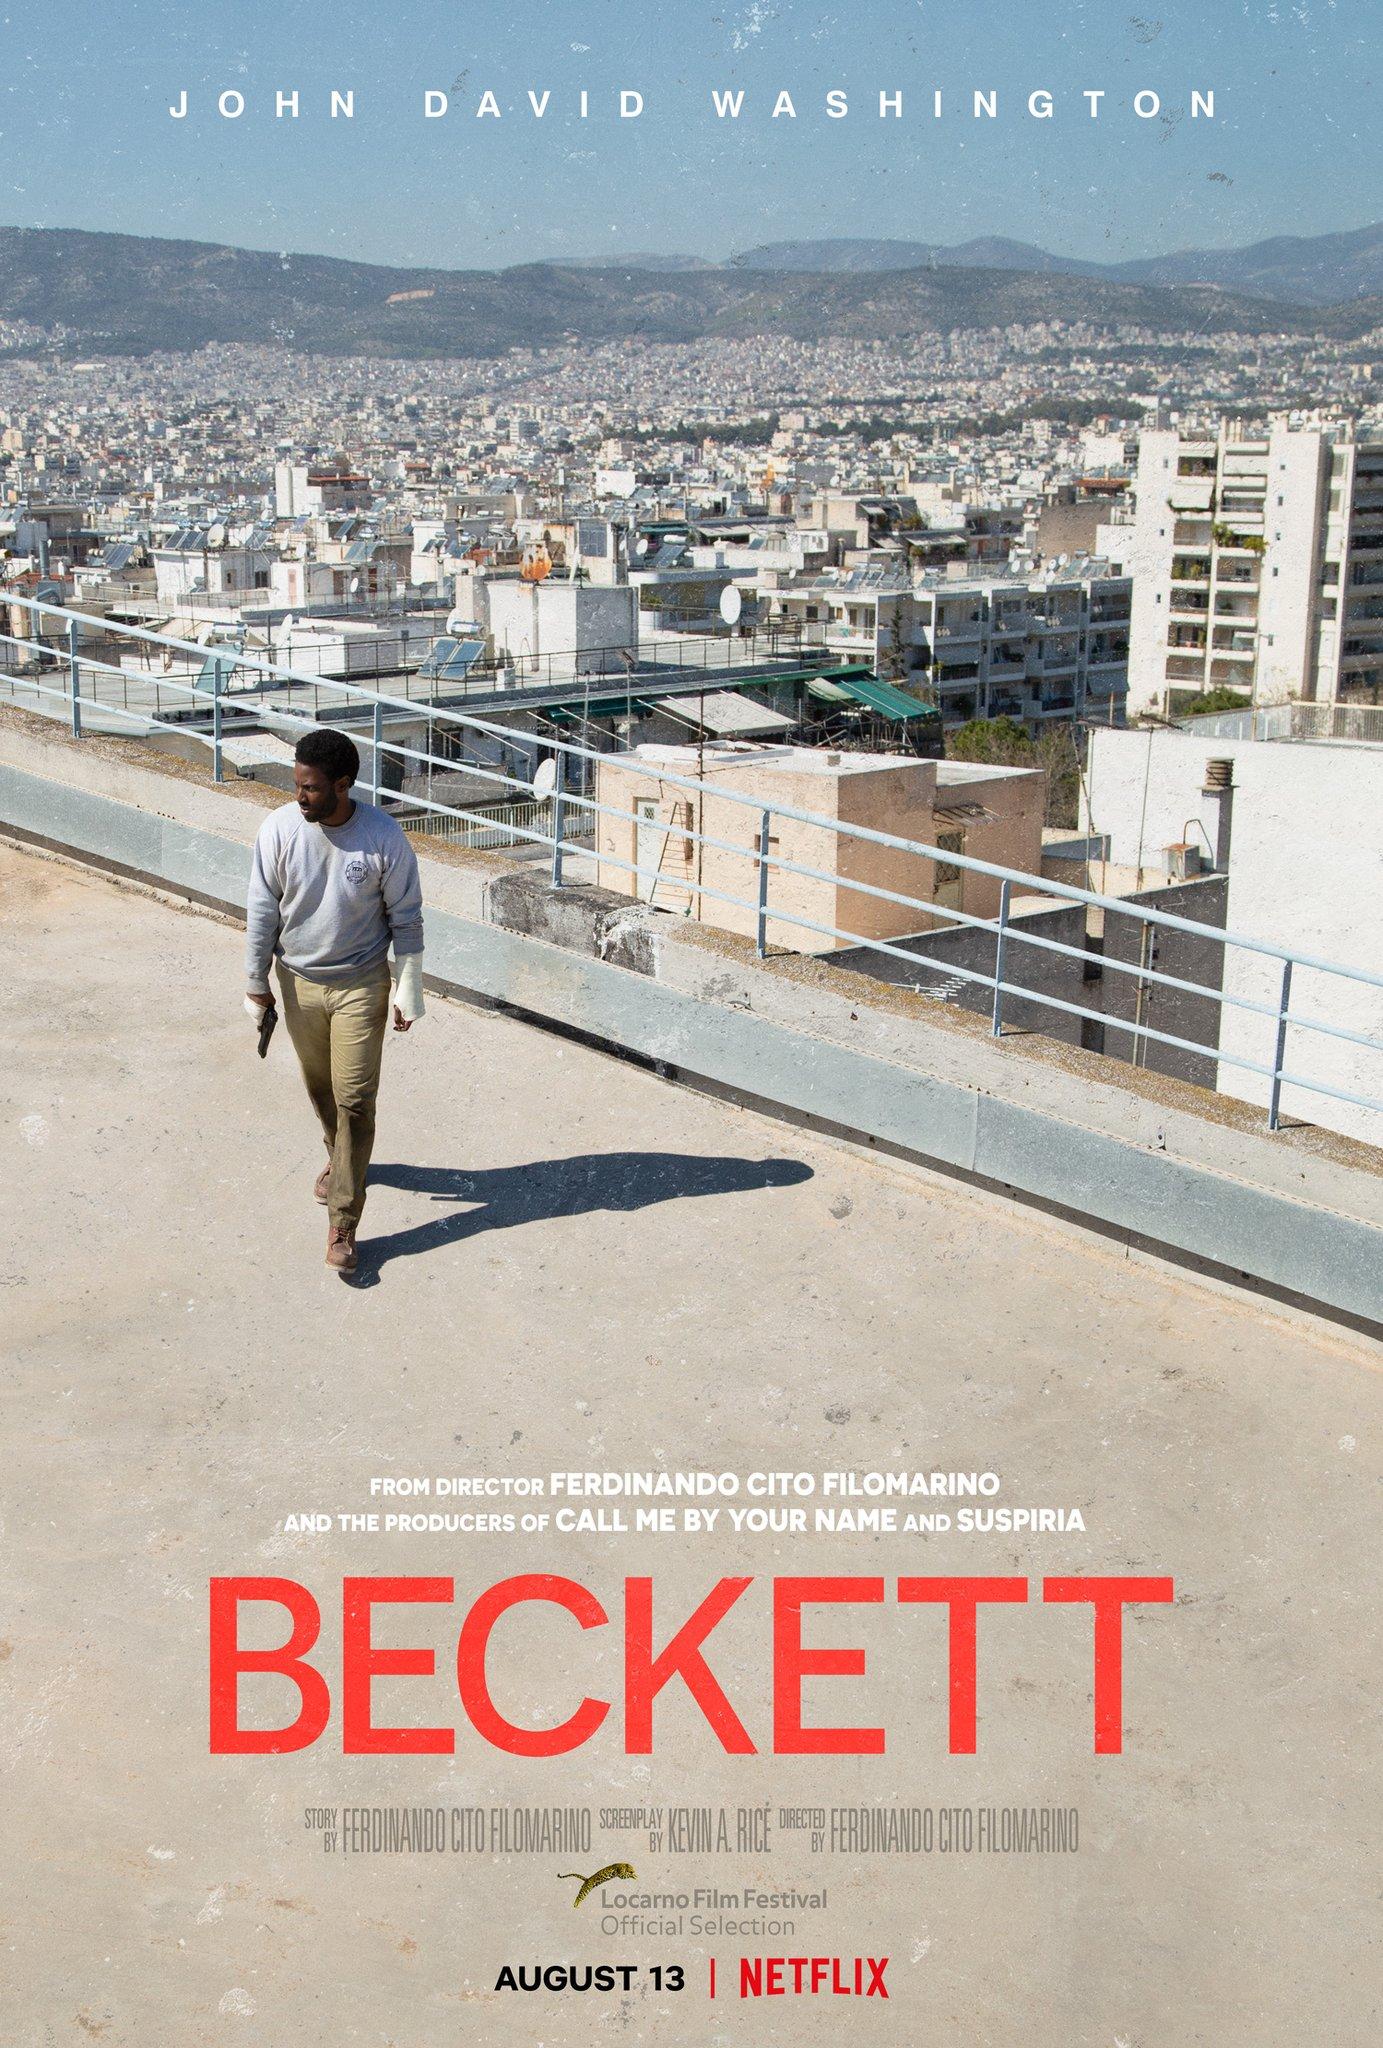 Download Filme Beckett Qualidade Hd